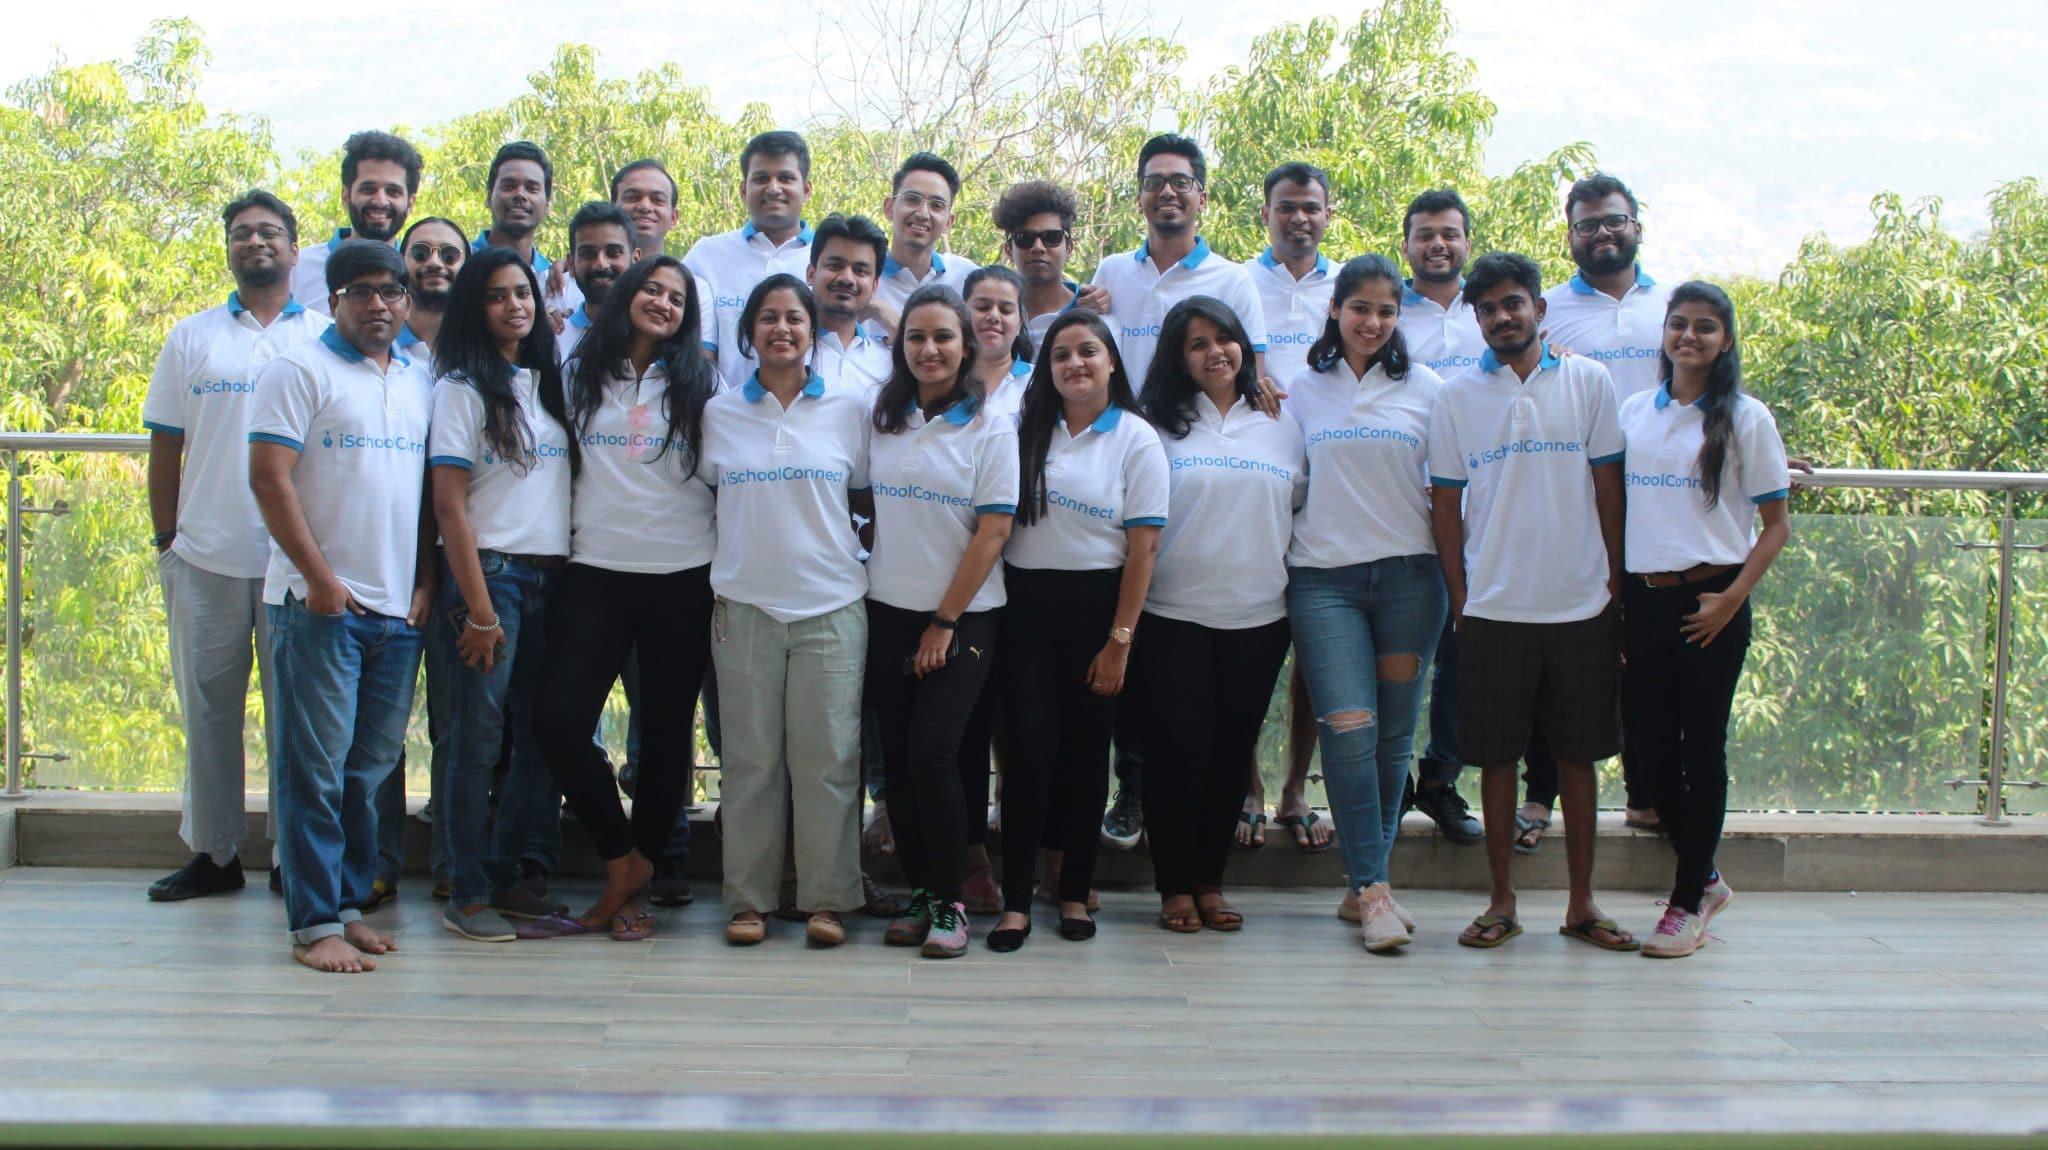 iSchoolConnect team